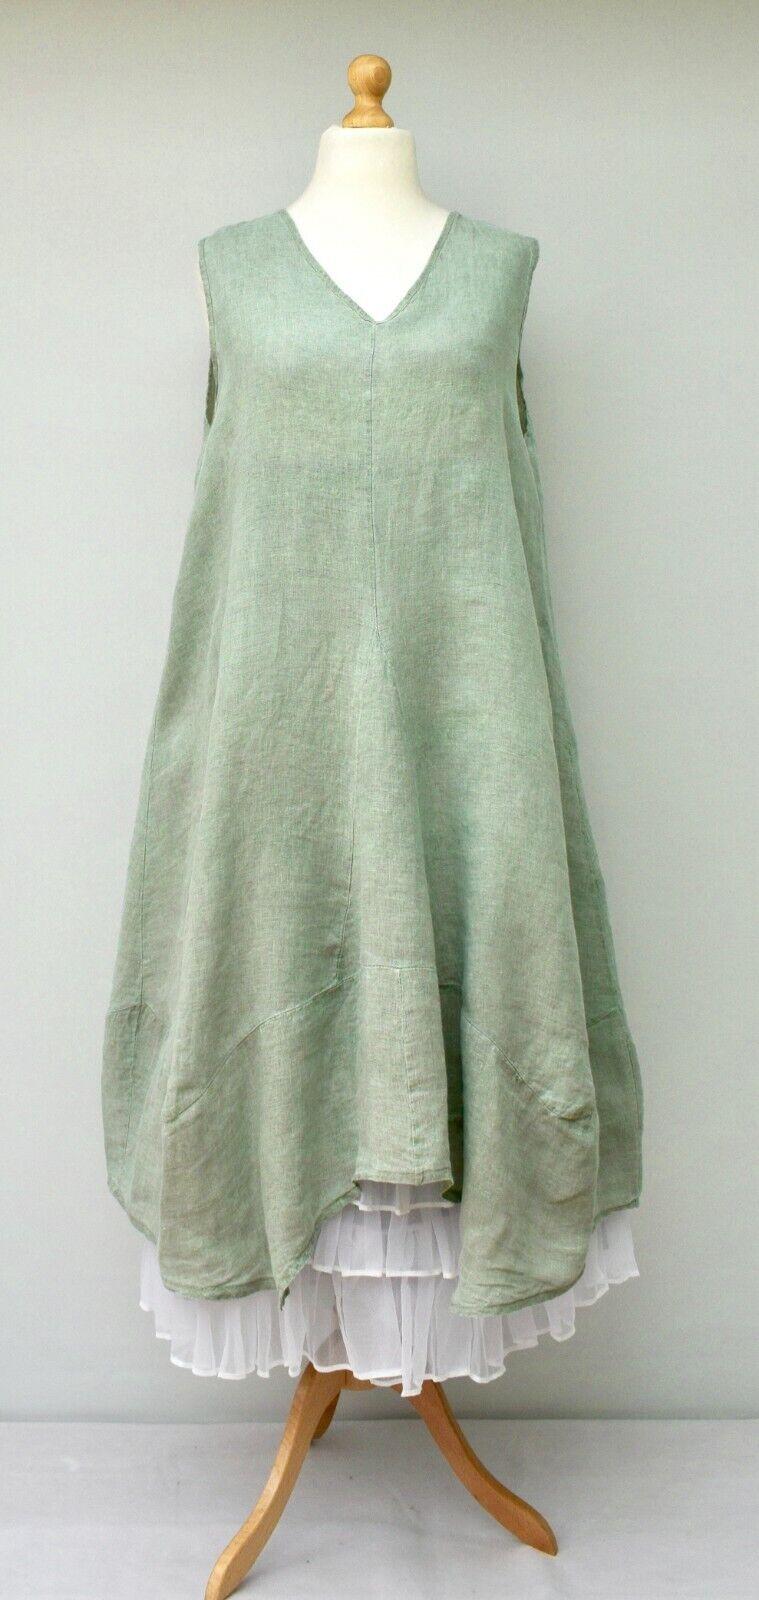 Frau ITALIAN LINEN OVERGrößeD PLAIN A-LINE Lange KleidMINTBUST UP TO 50  ITALY